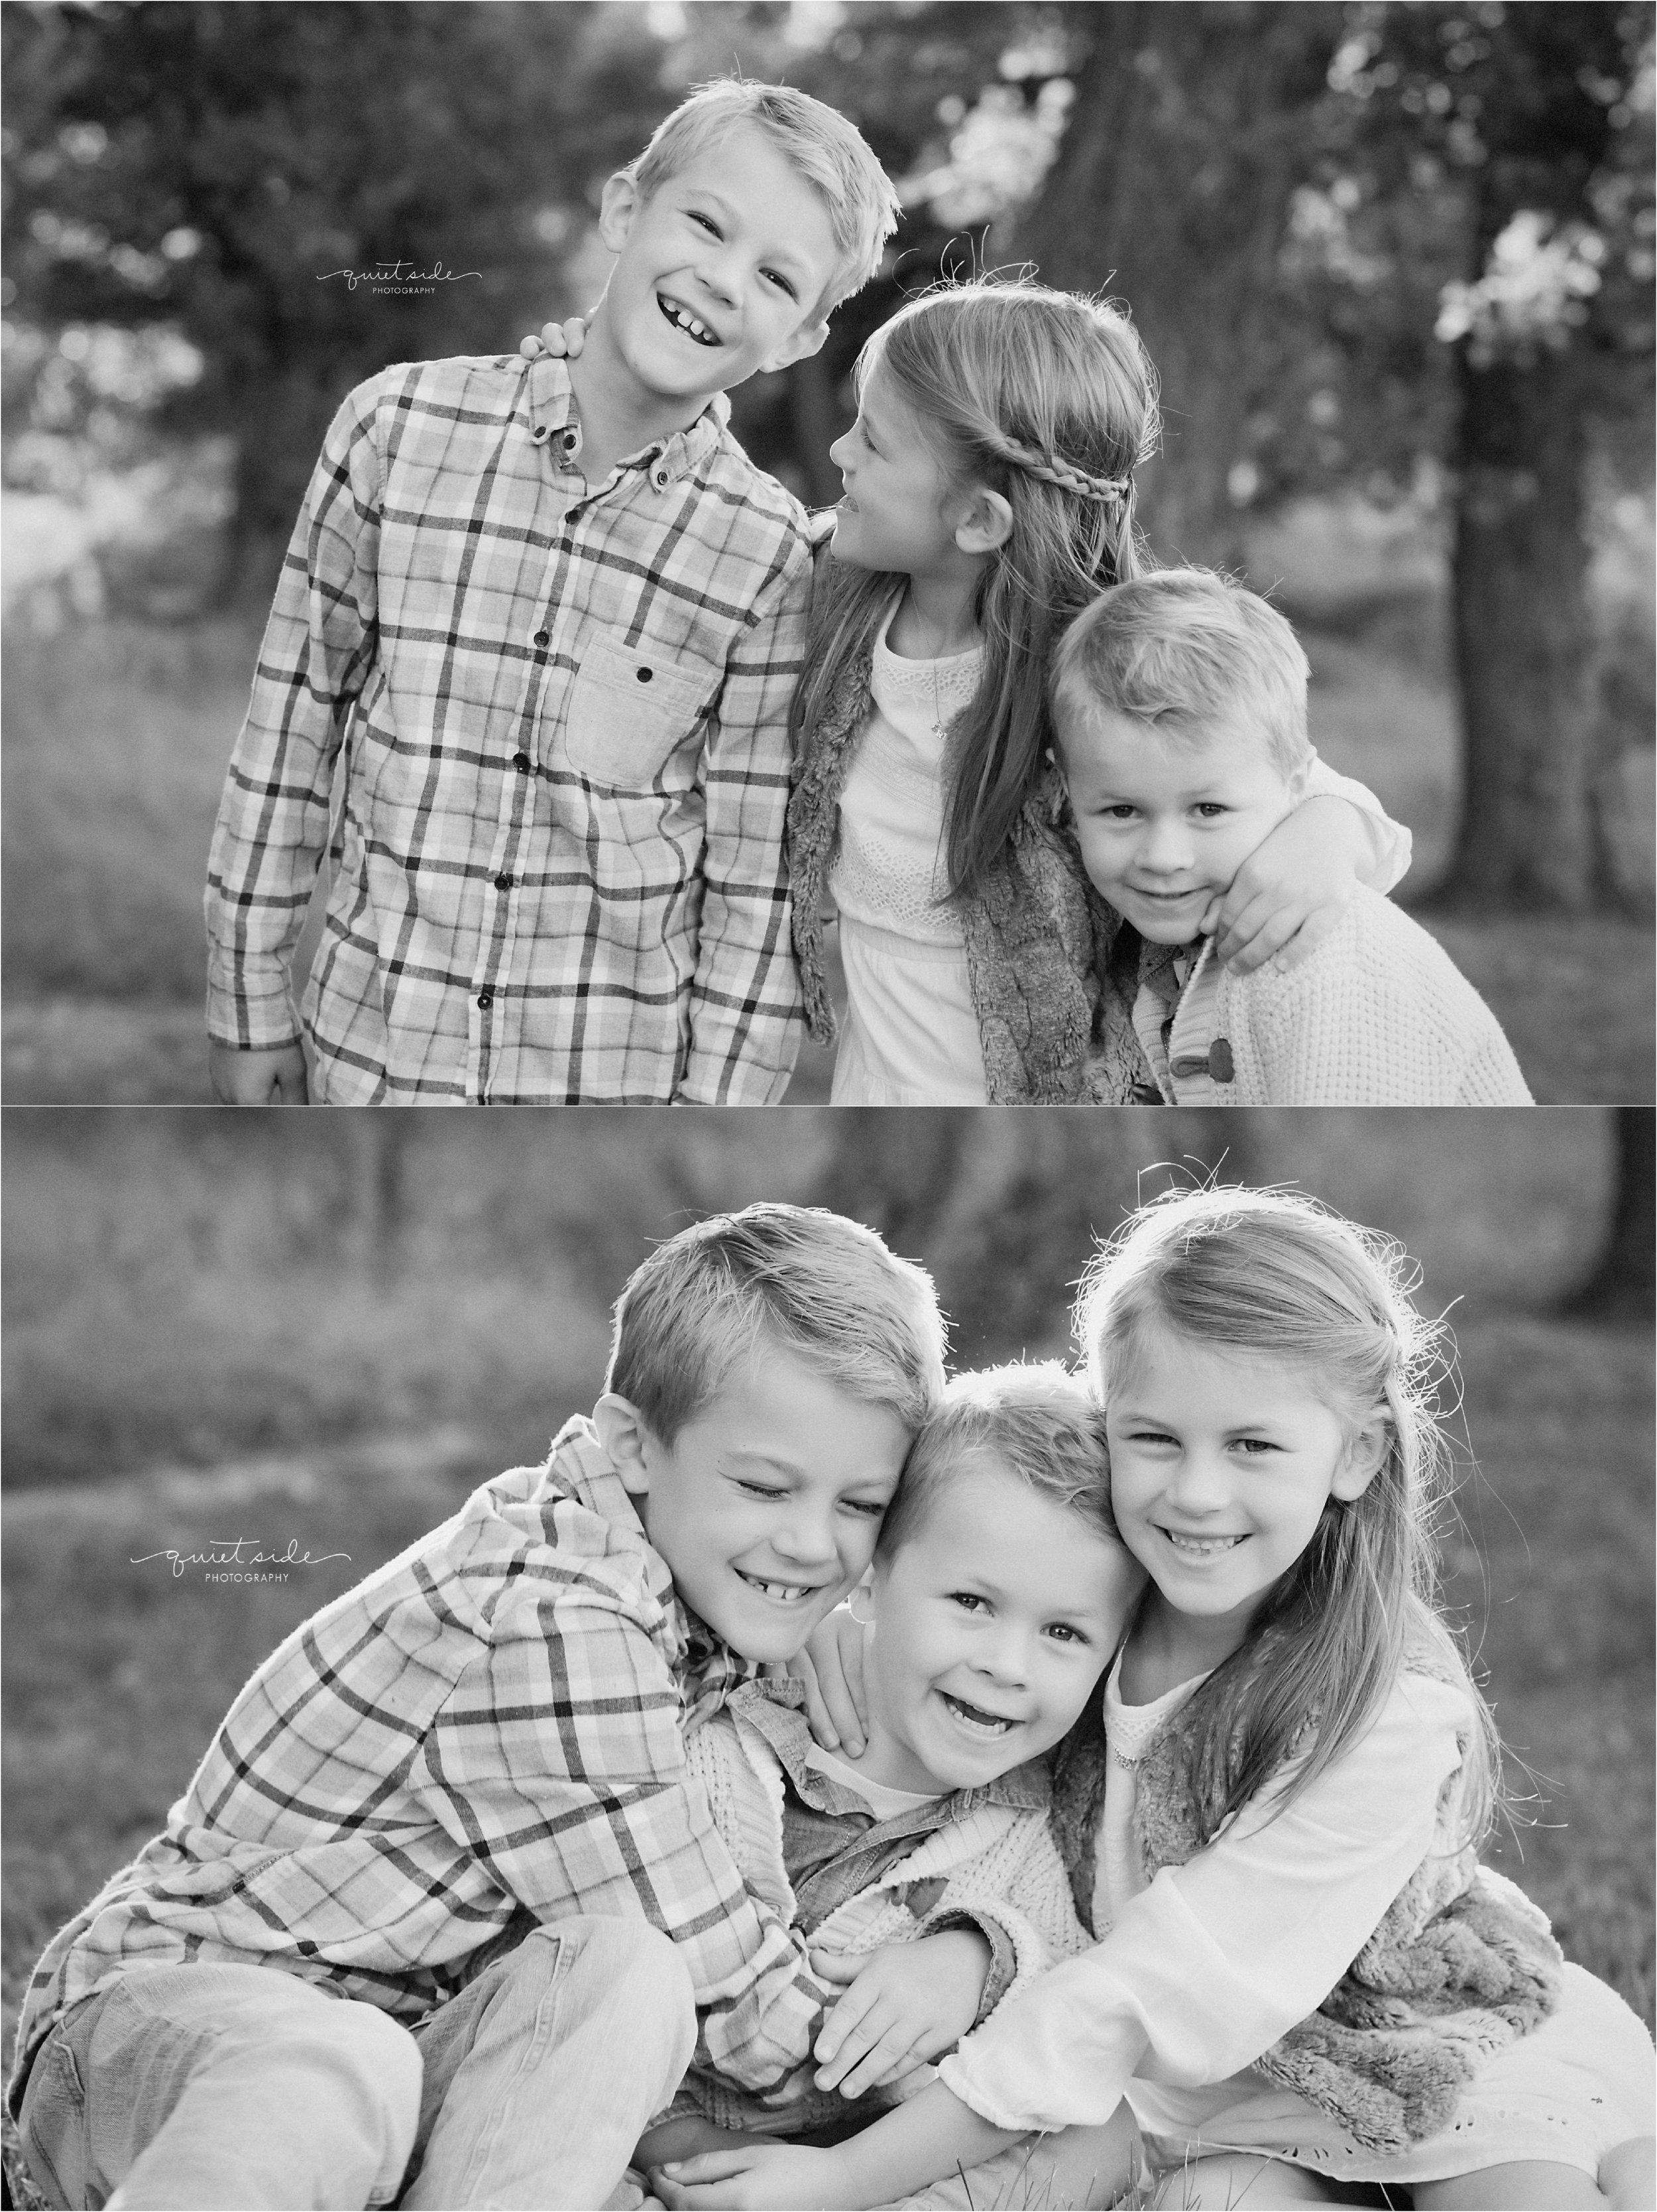 QuietSidePhotography-Purcellville, VA- Family-Photographer-Motherhood-Familyof5-SilverbrookFarm-GoldenHour-Sunset-Family-kids-siblings-Loudoun County-Virginia.jpg